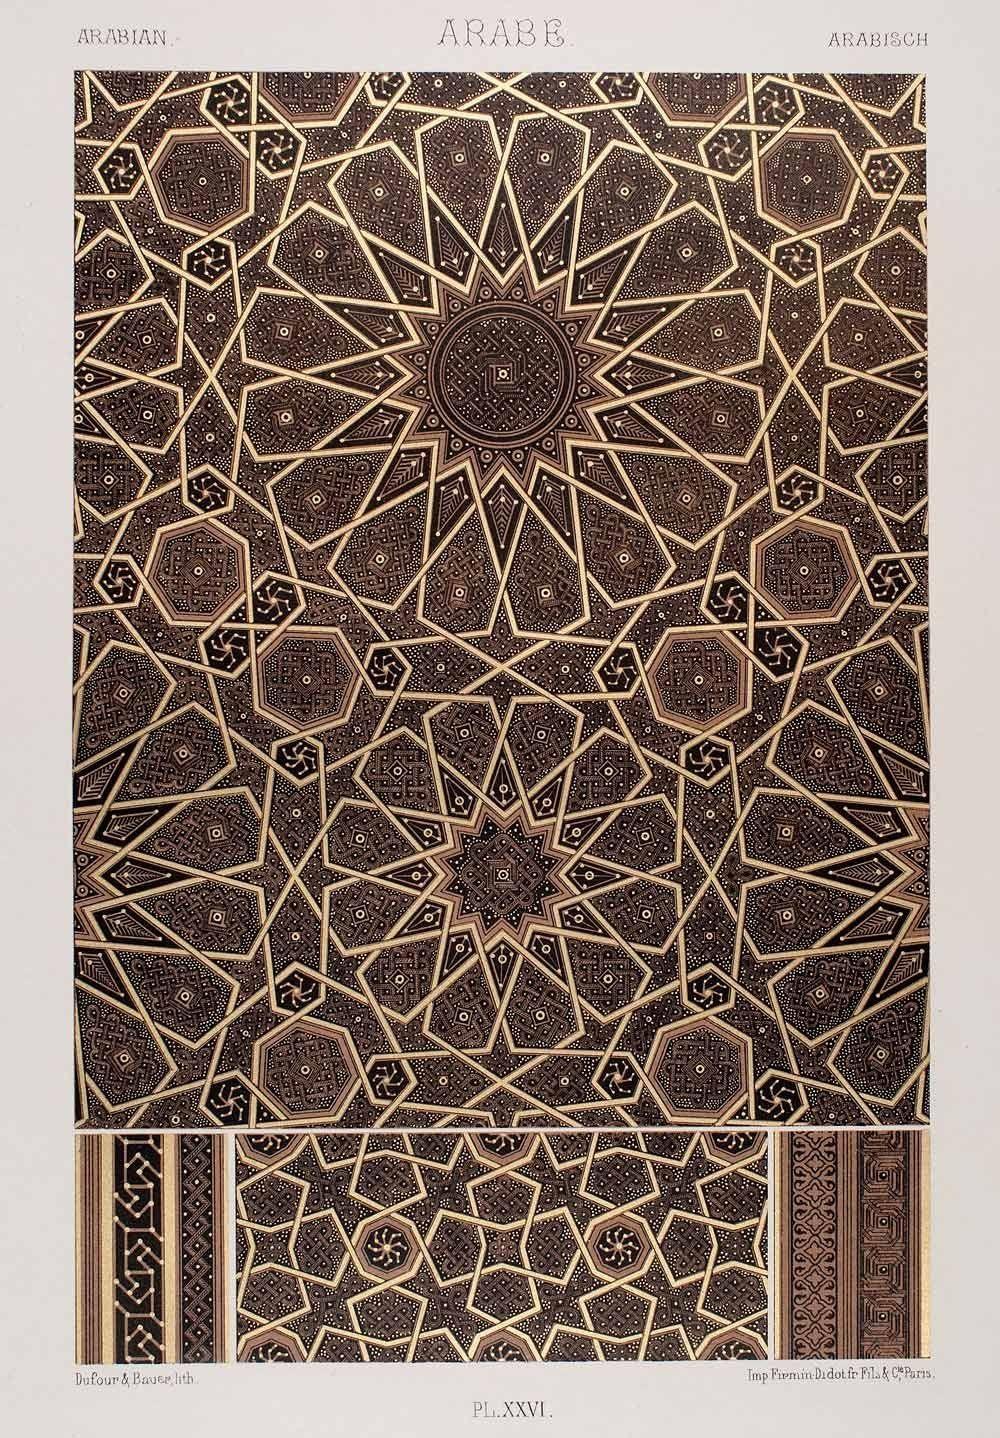 1875 Chromolithograph Geometric Pattern Islamic Art Arabic Design Motif Quran Islamic Art Pattern Islamic Art Geometric Art